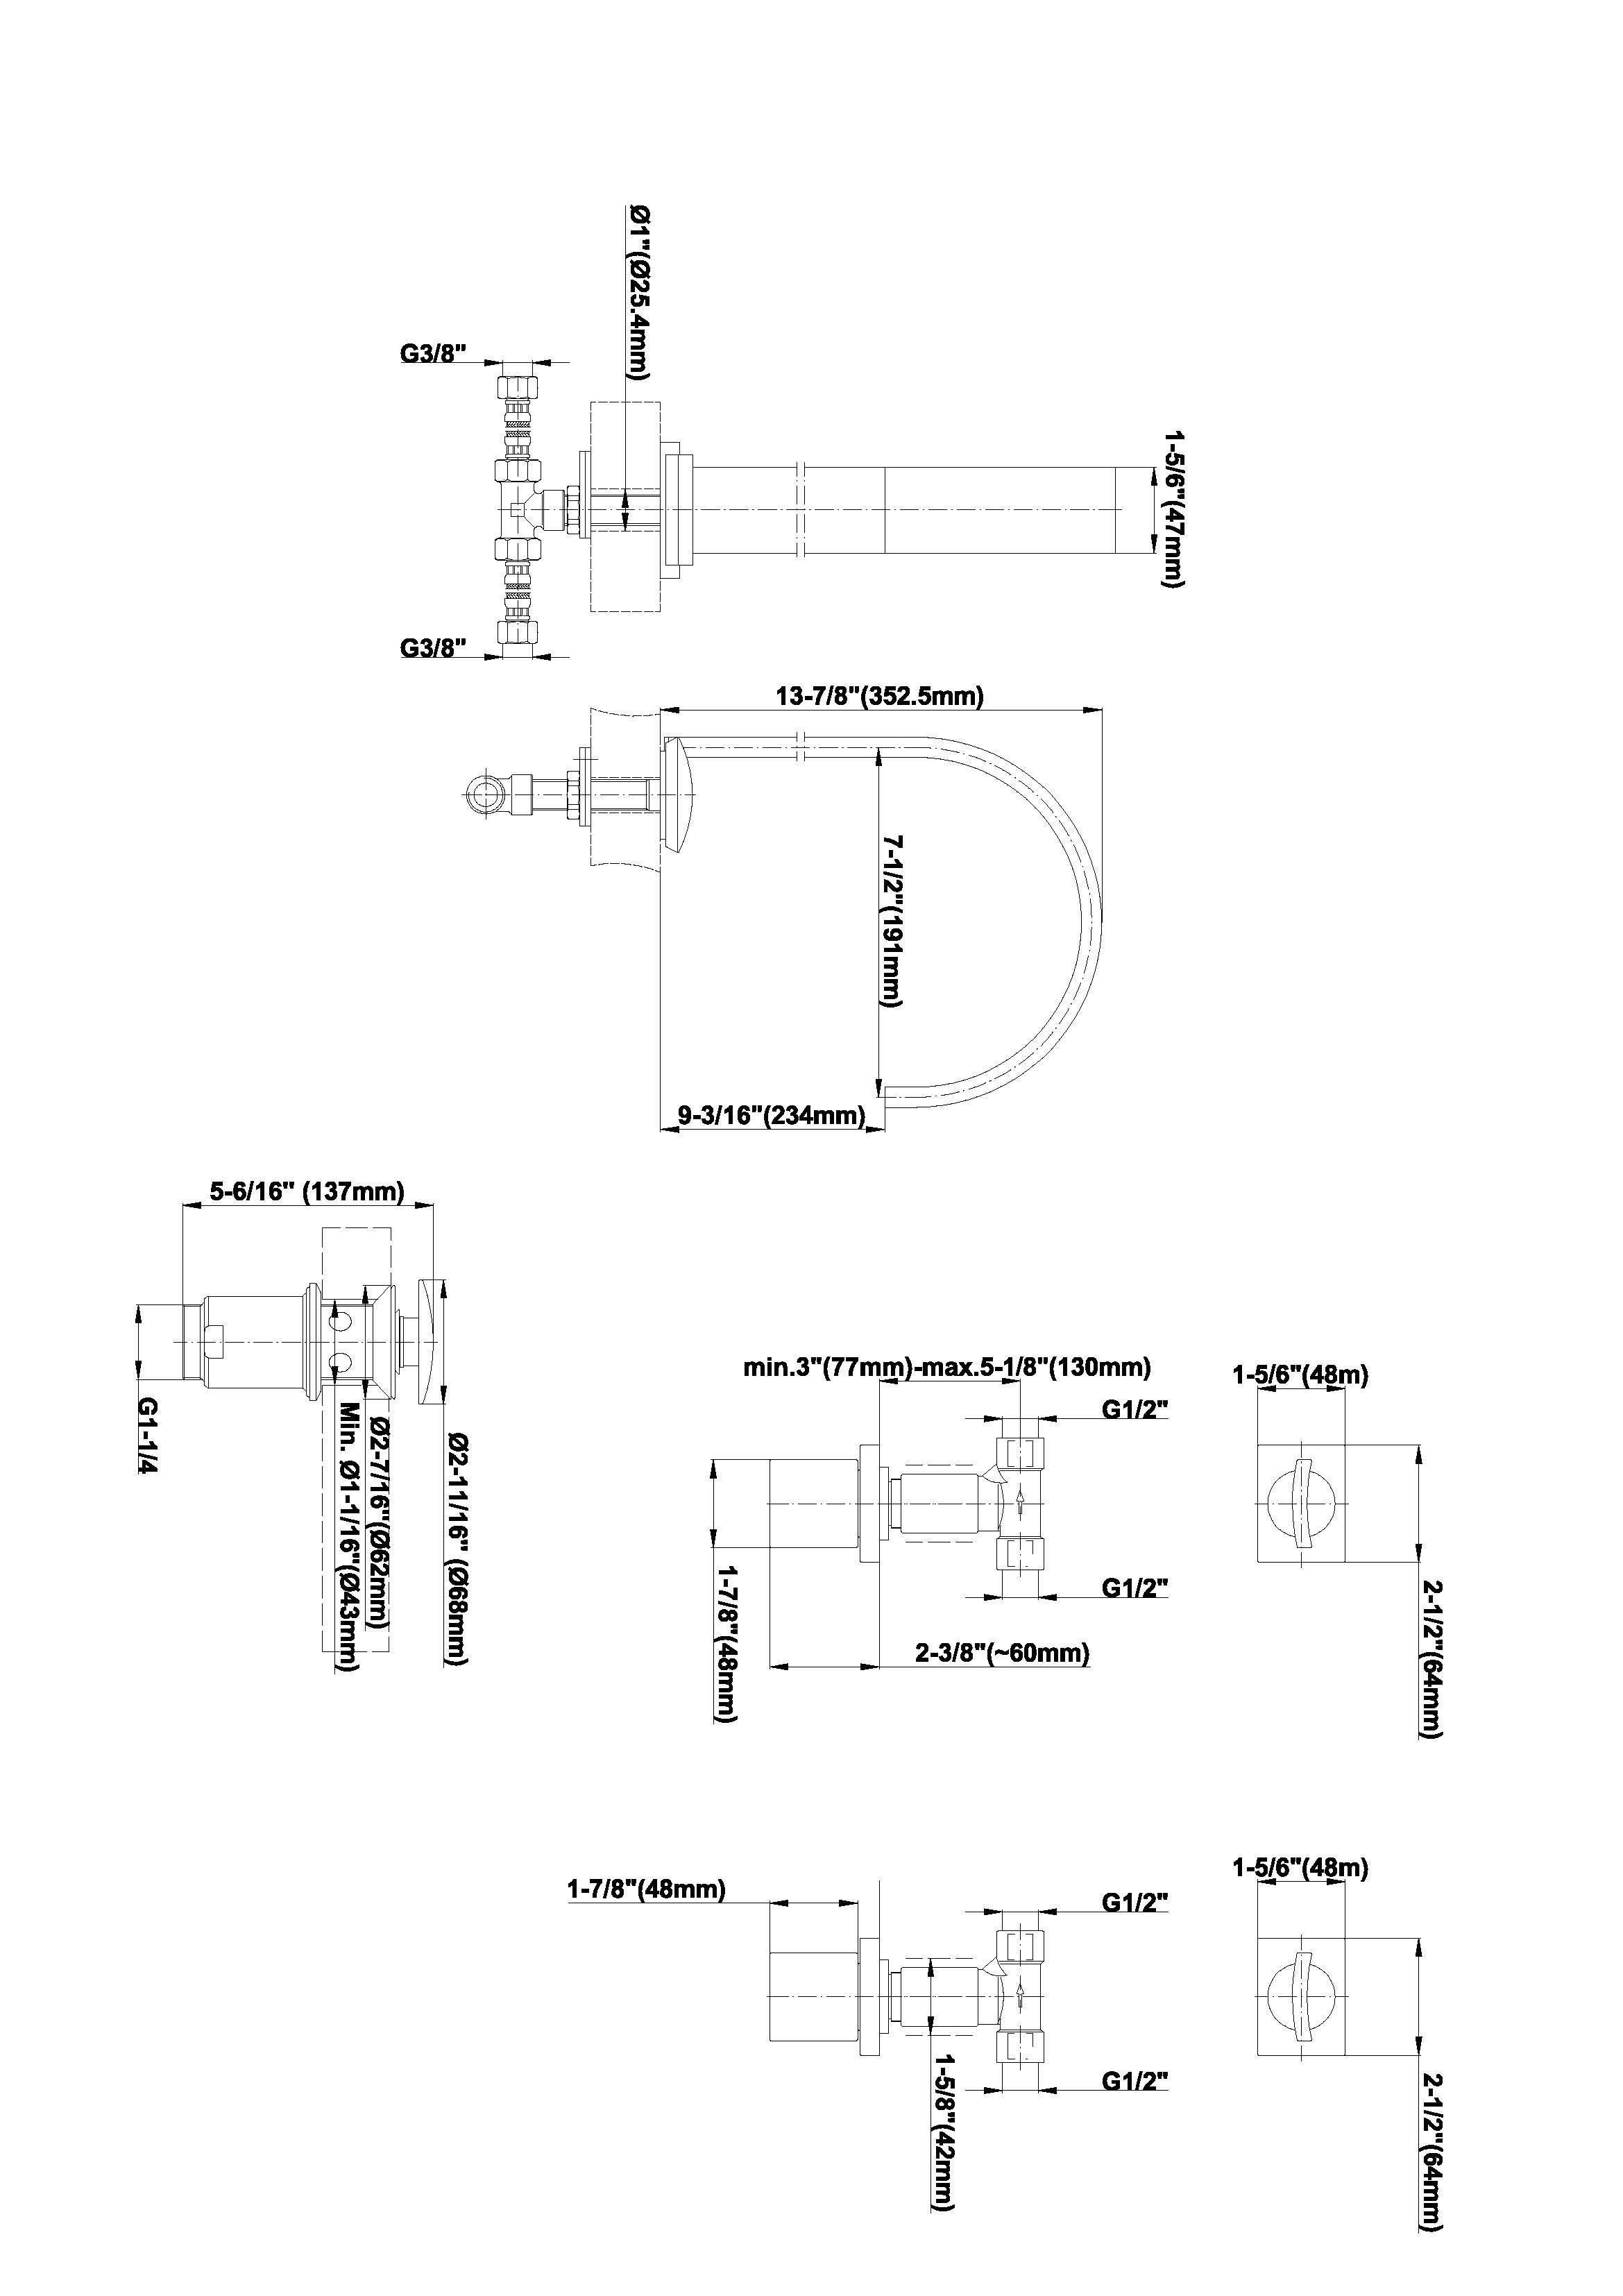 Baterie de lavoar cu valve montate in perete Graff Sade 2332900 Fisa tehnica